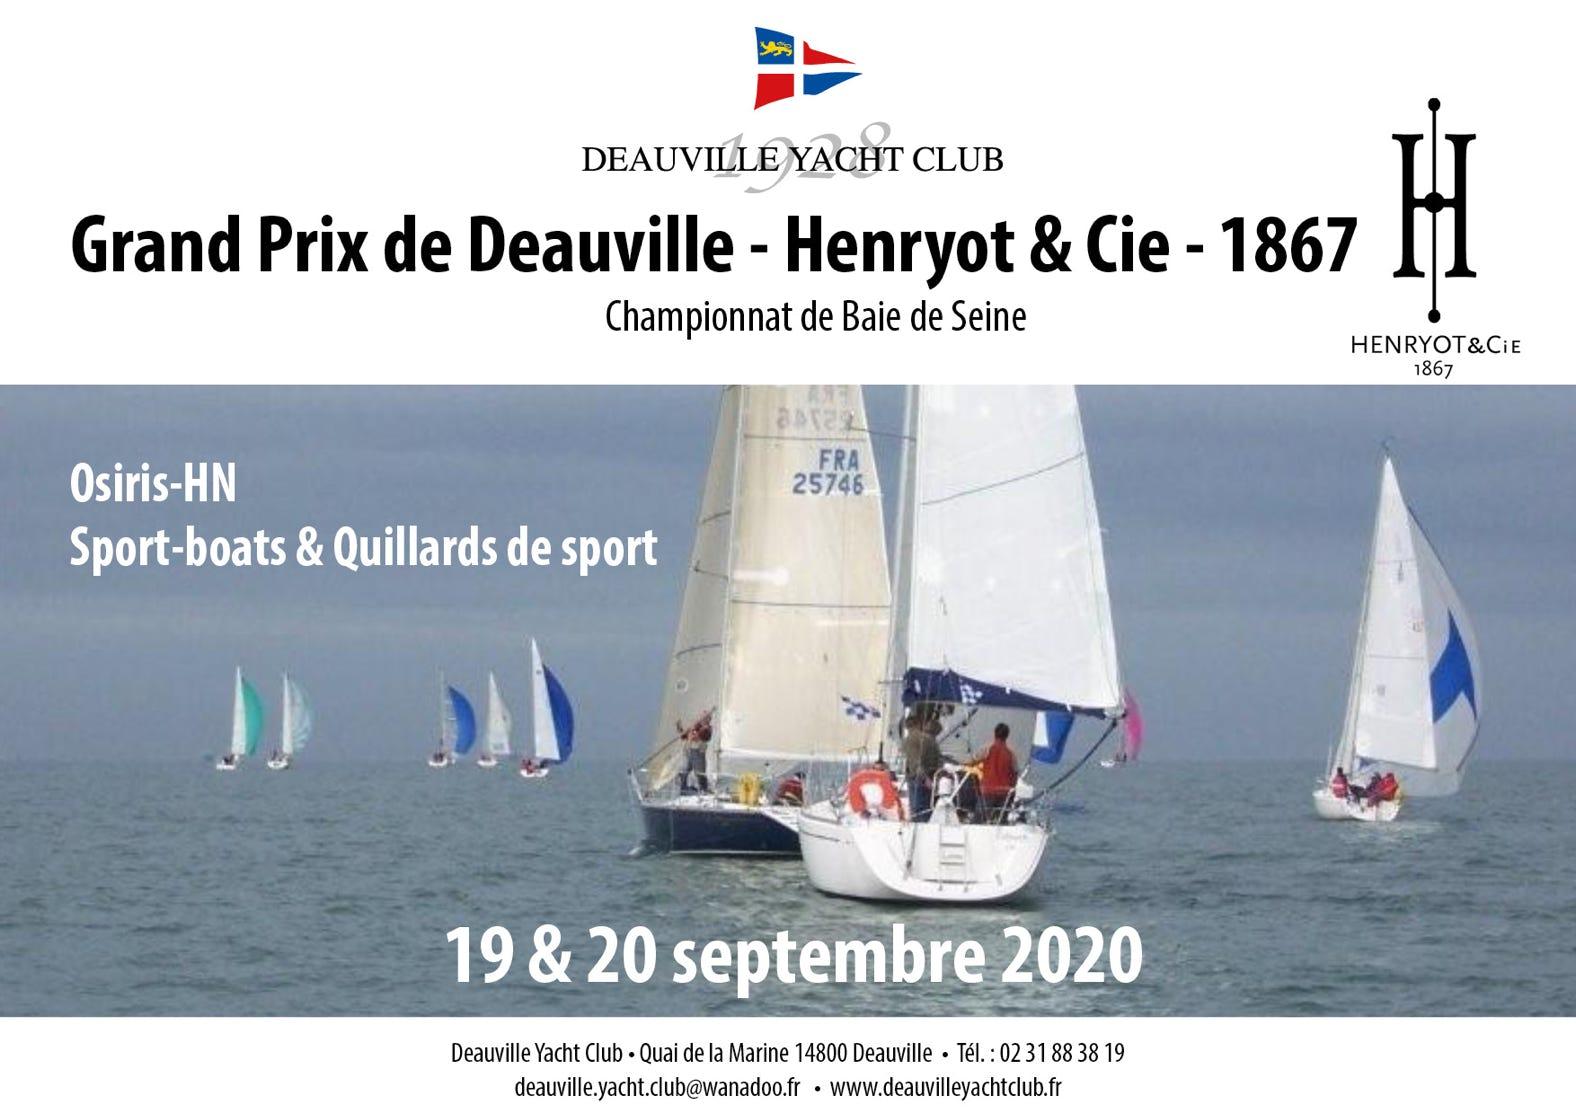 grand_prix_deauville_henryot_cie